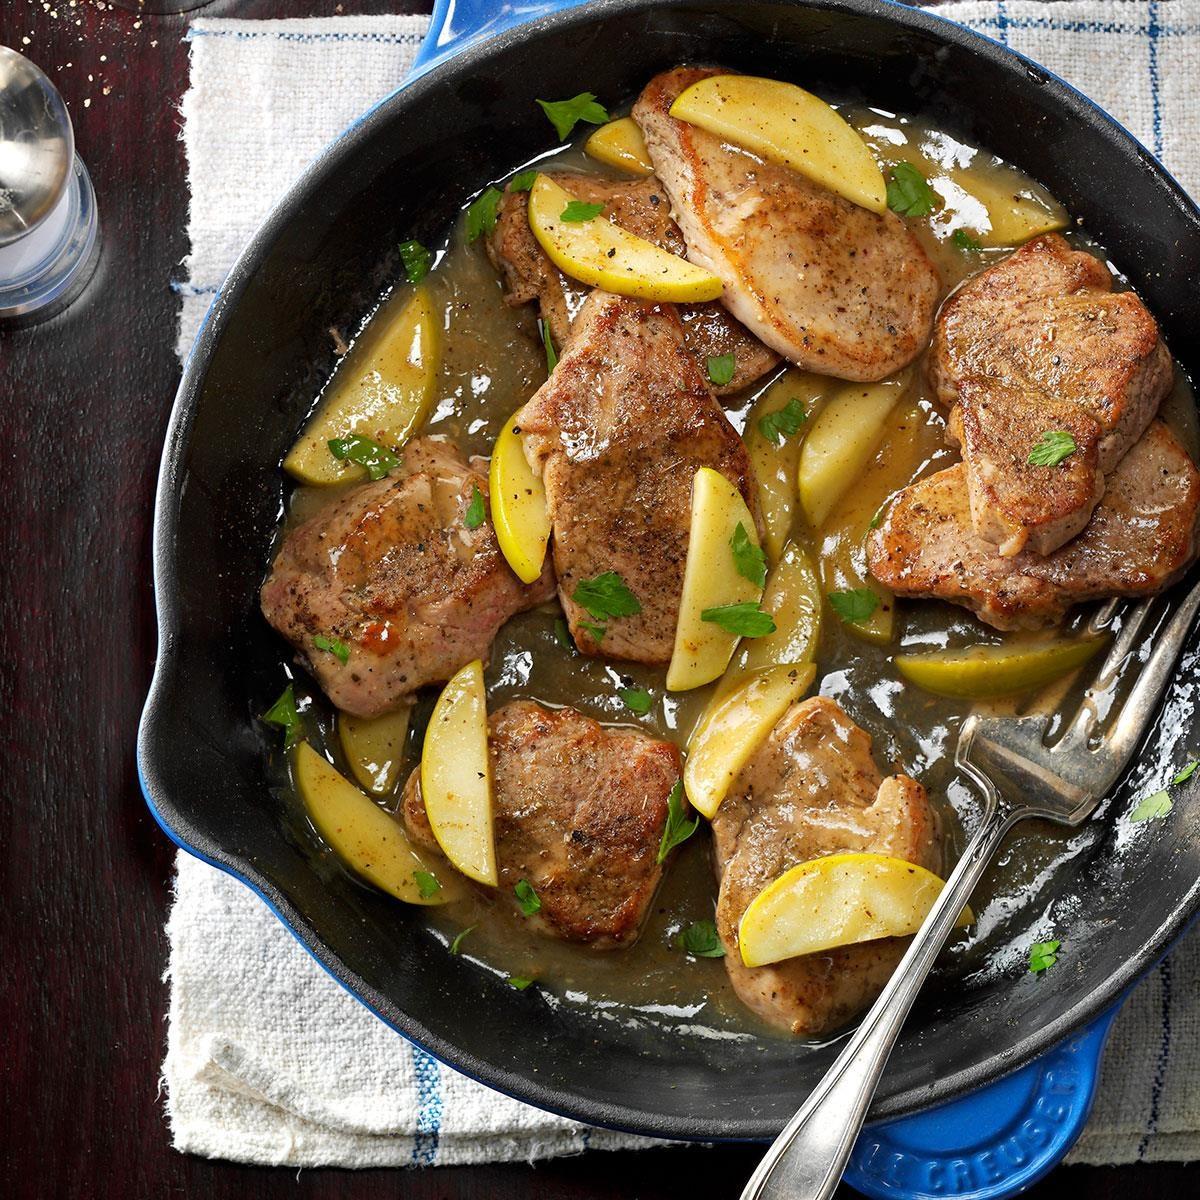 Monday: Apple & Spice Pork Tenderloin